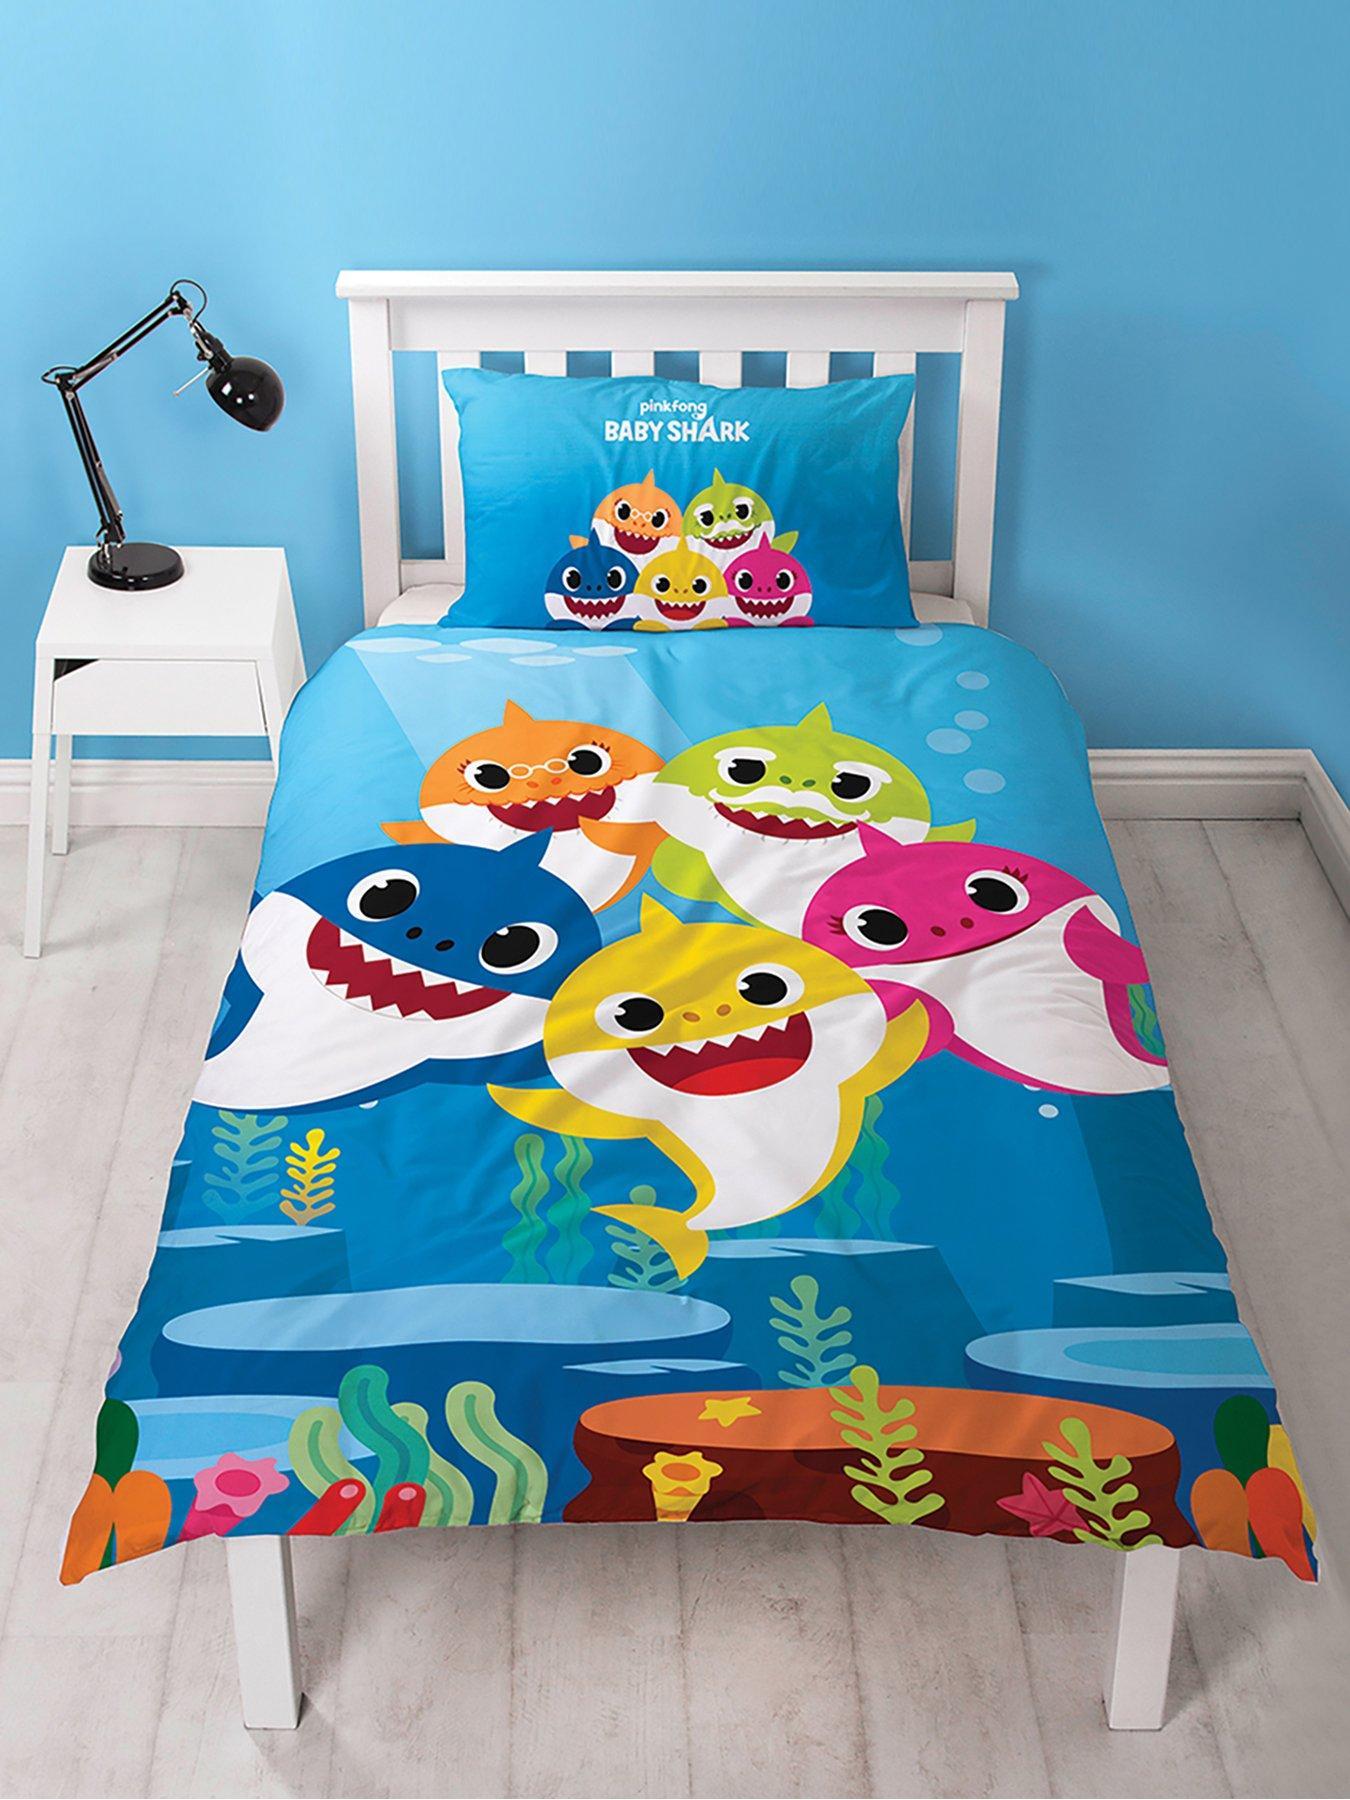 Bedding 3d Minecraft Games Design Bedding Set Of Duvet Cover Pillowcase Single Double Stroudwoods Org Uk